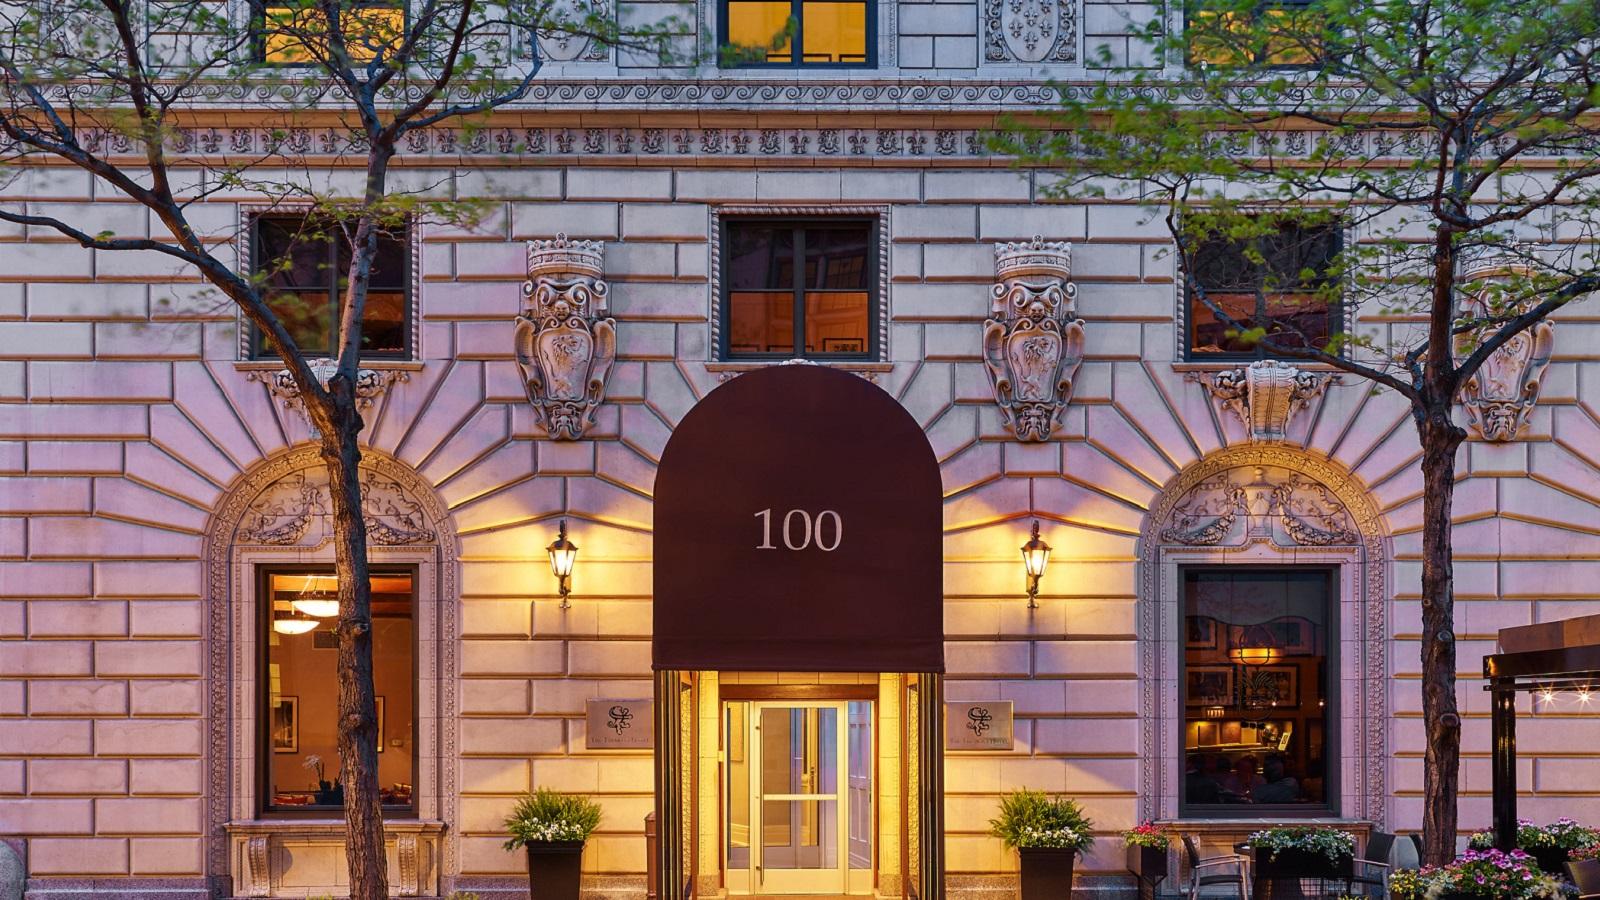 Tremont Chicago Hotel - Exterior-1